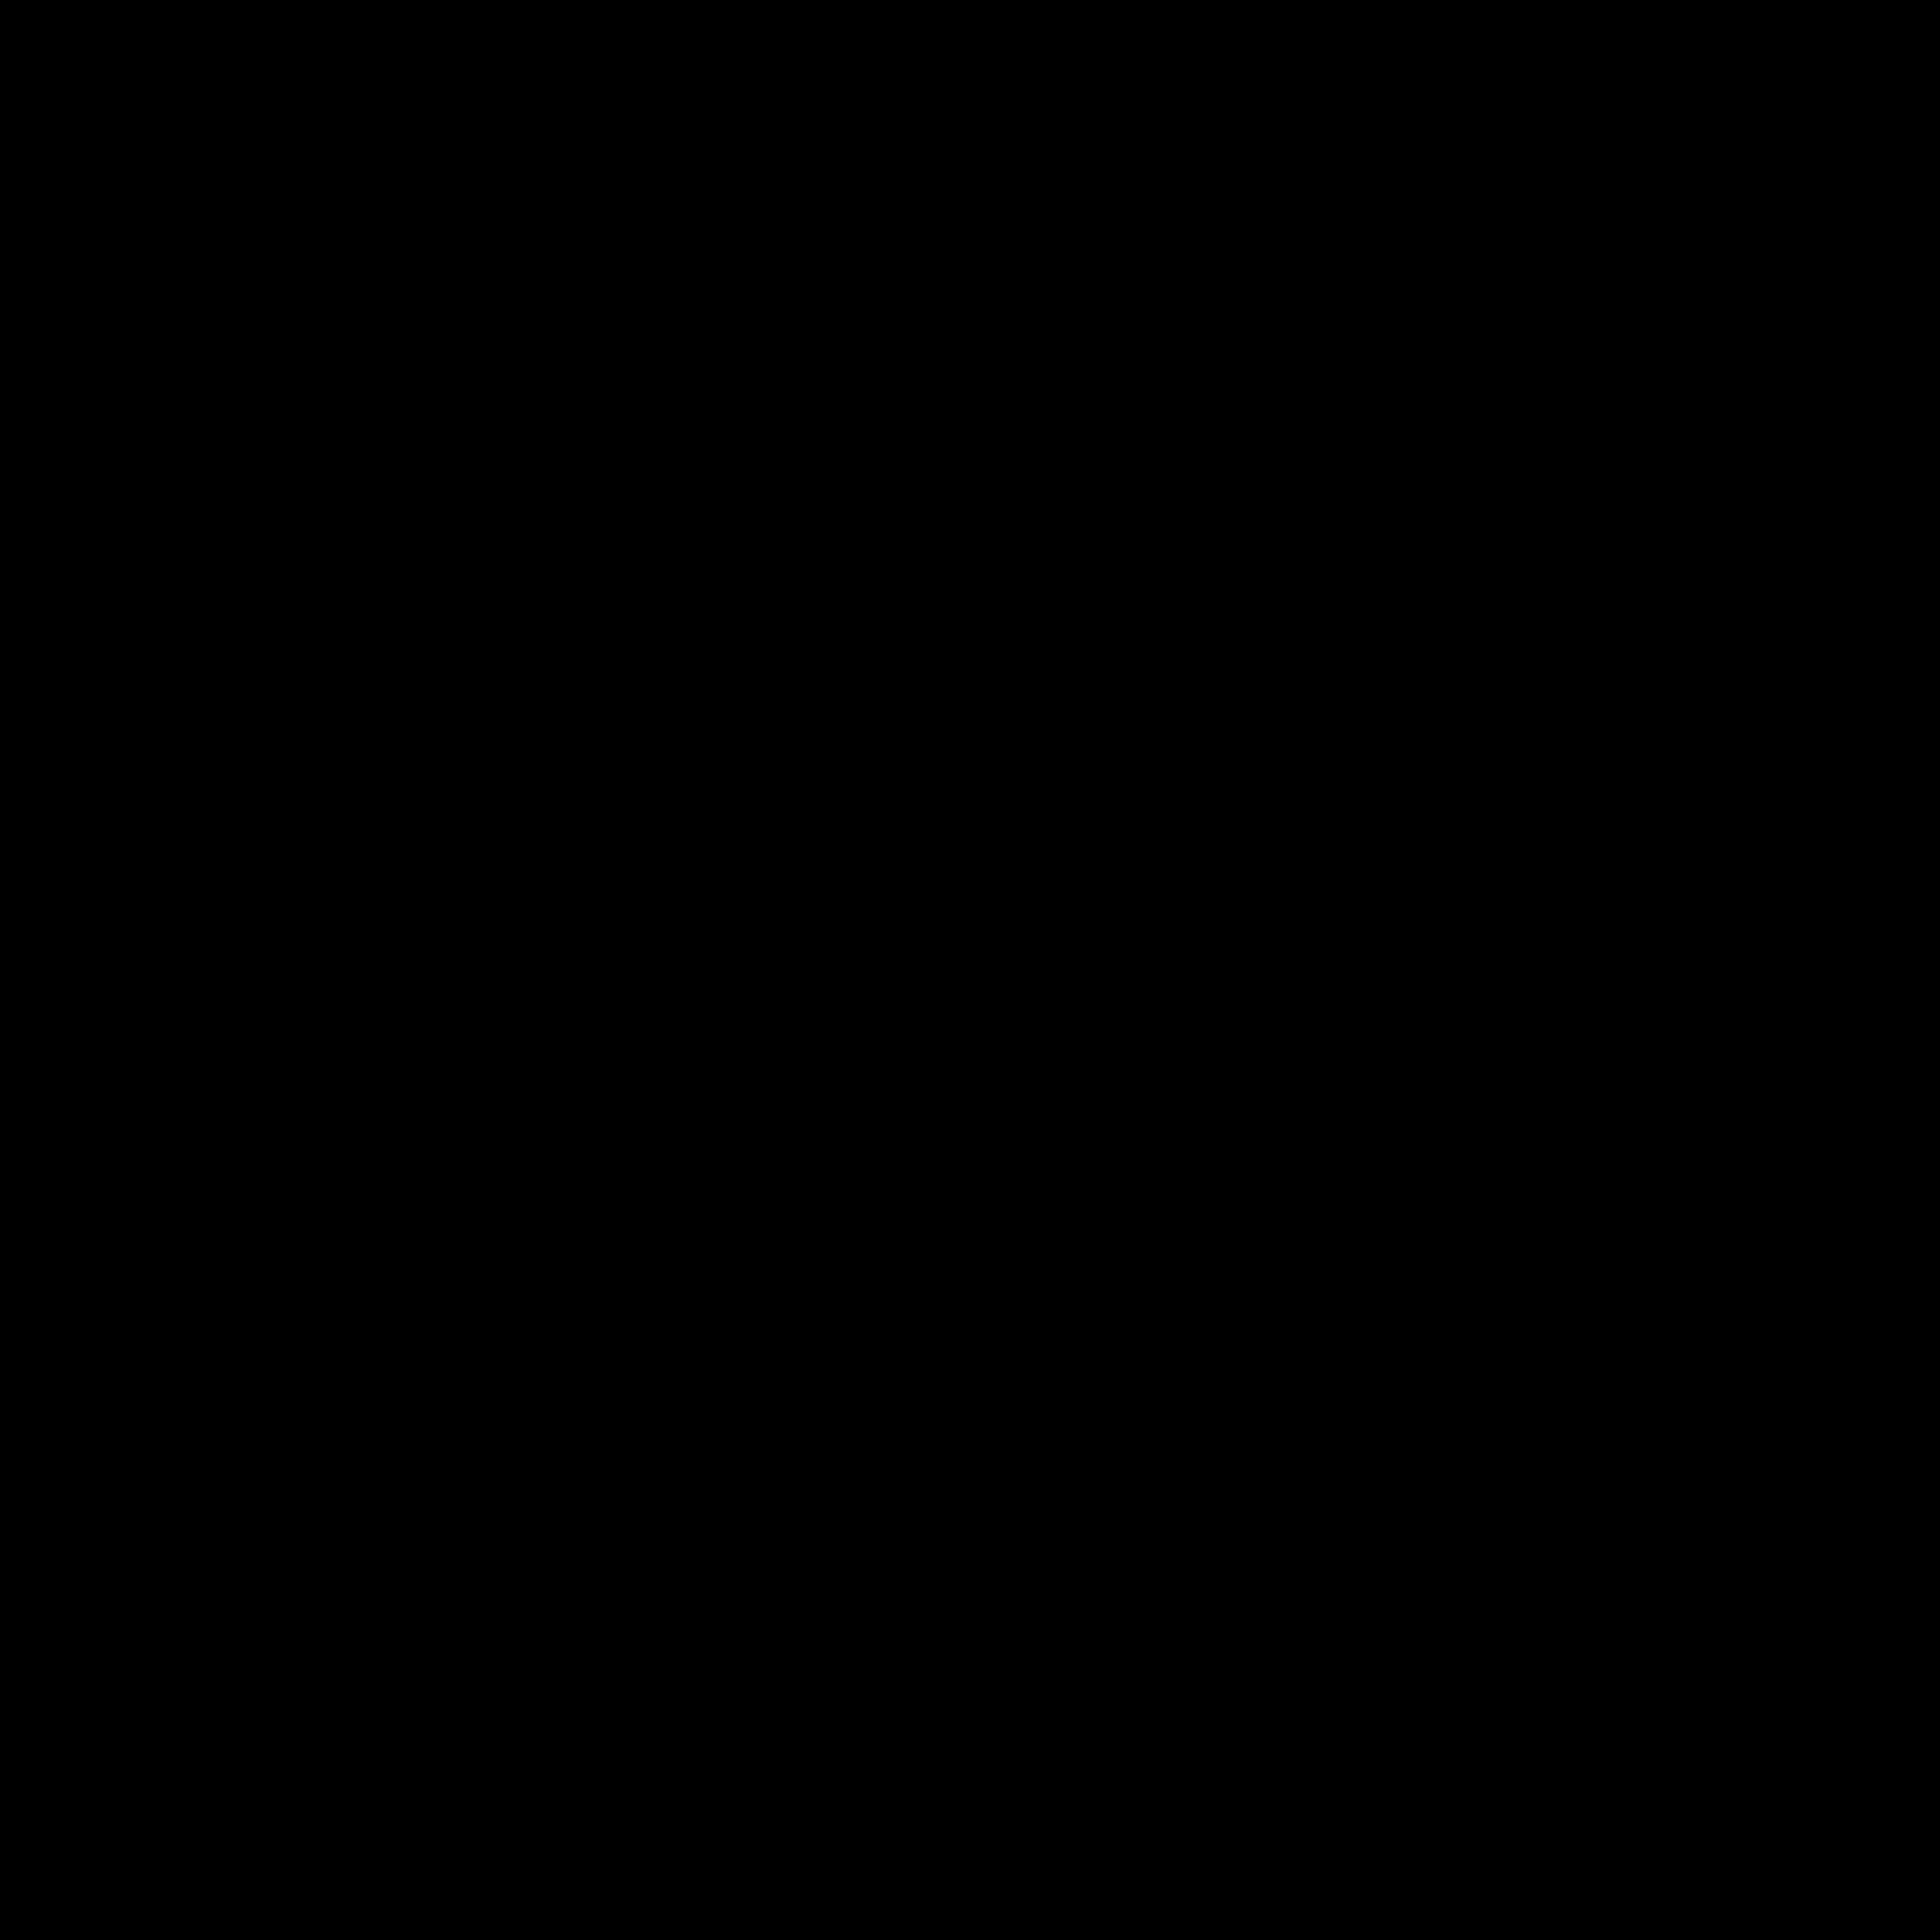 Website logo clipart clip download Website Icon Clipart - Clipart Kid clip download